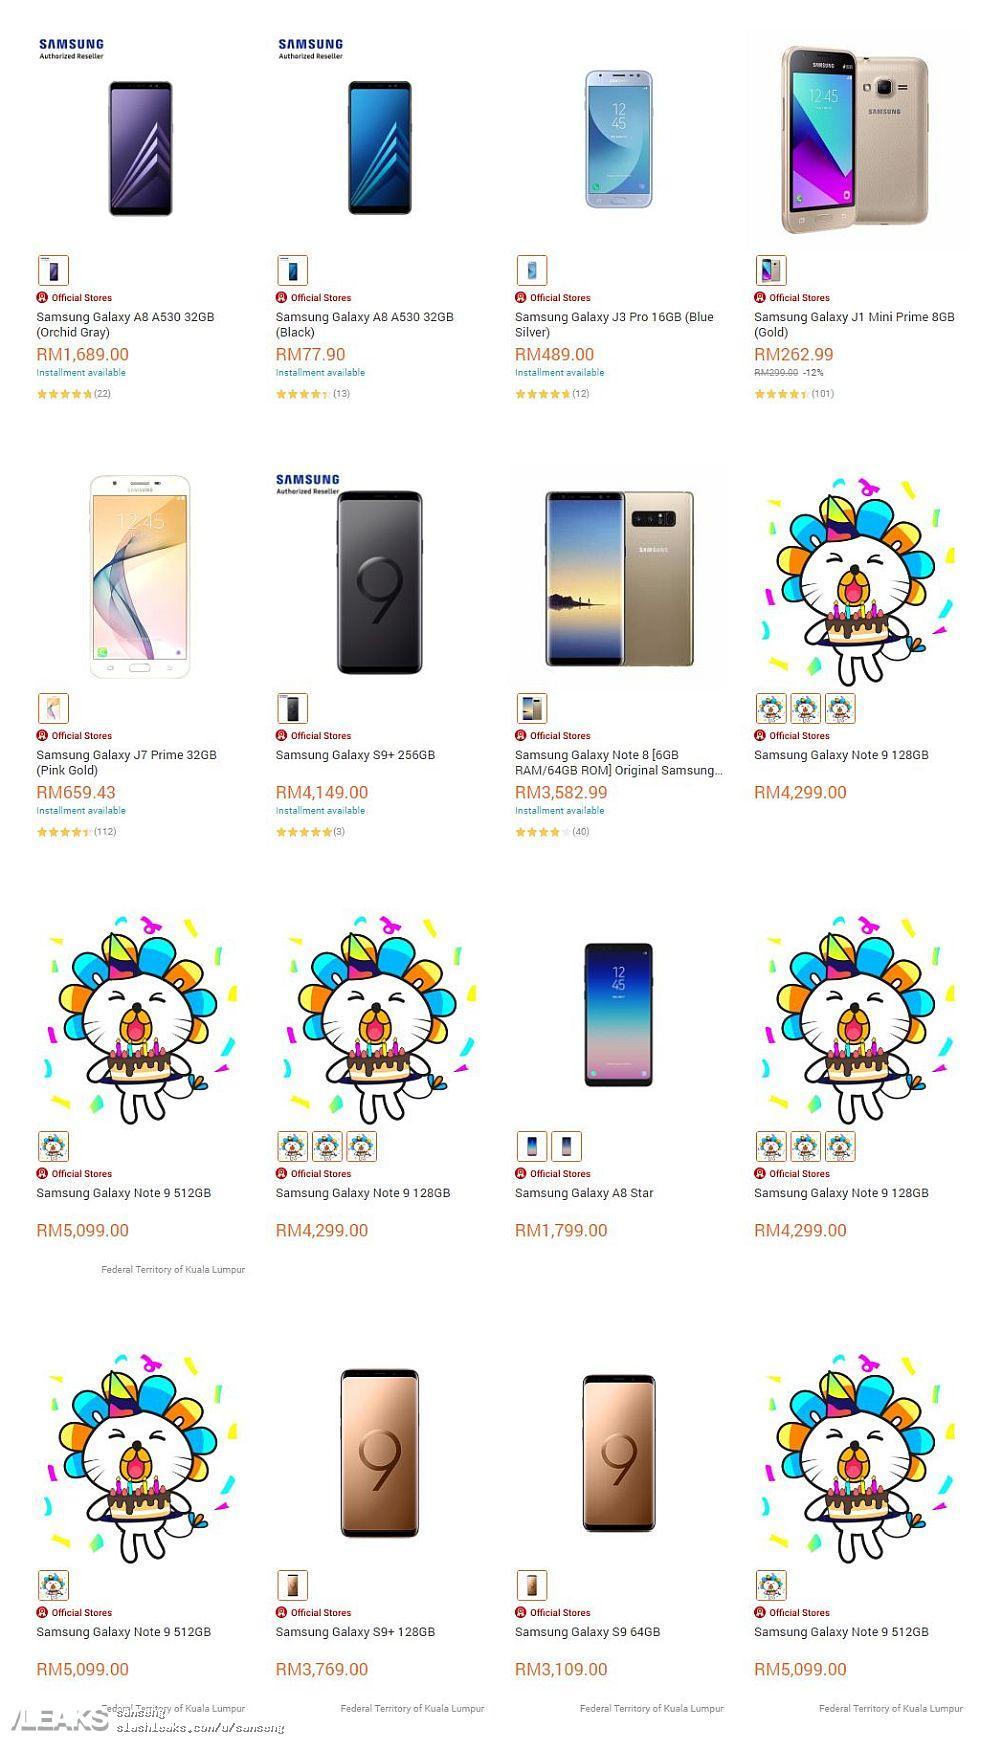 img 128GB + 512GB Samsung Galaxy Note9 price leaked on lazada